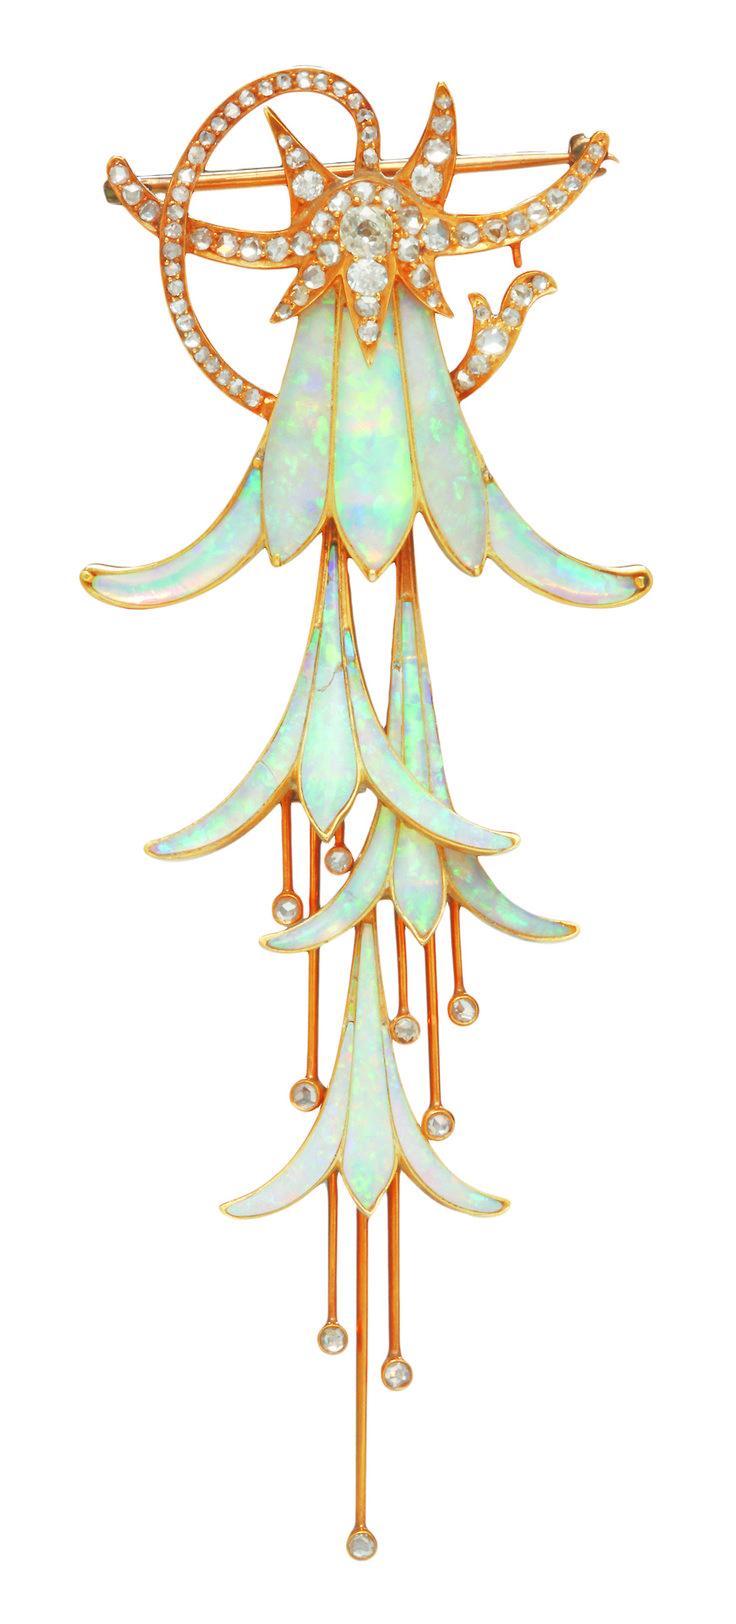 Wedding Theme - Art: Nouveau #2557354 - Weddbook